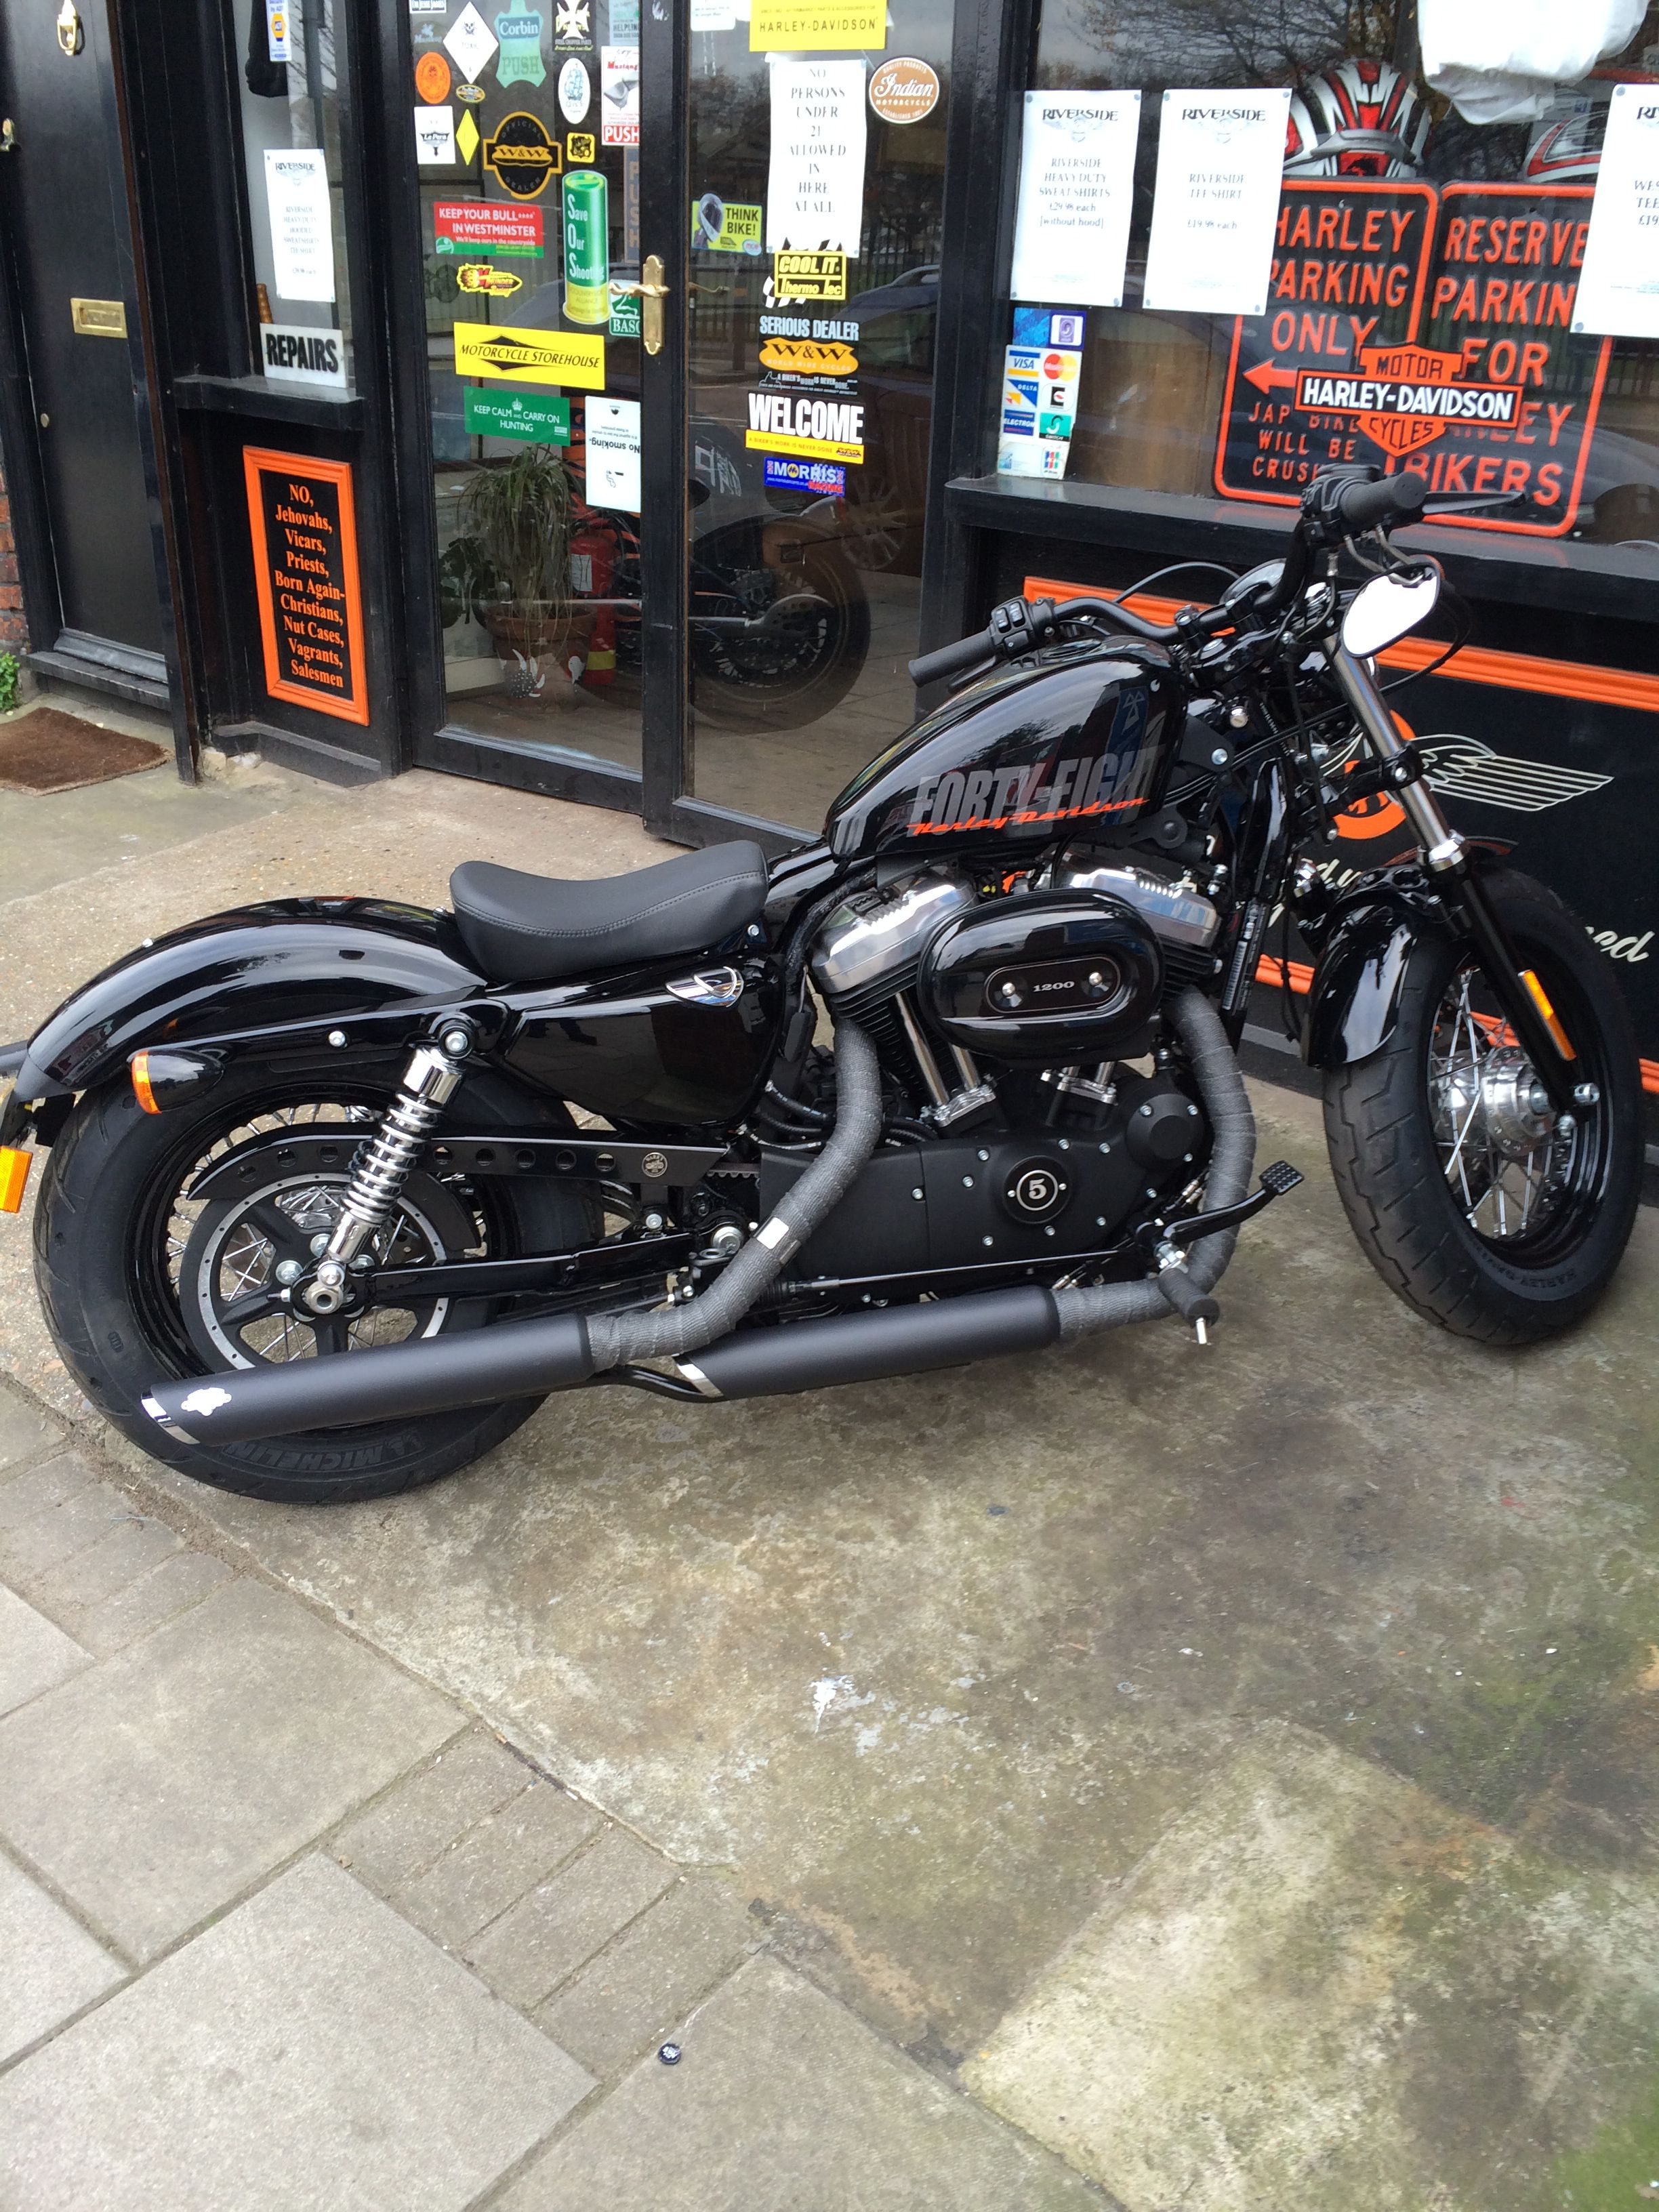 2014 Harley Davidson 48 with Vance & Hines slip ons #sportster48 #harleydavidson #fortyeight #HD48 #harley48 #bobber WANT THIS BIKE!!!!!